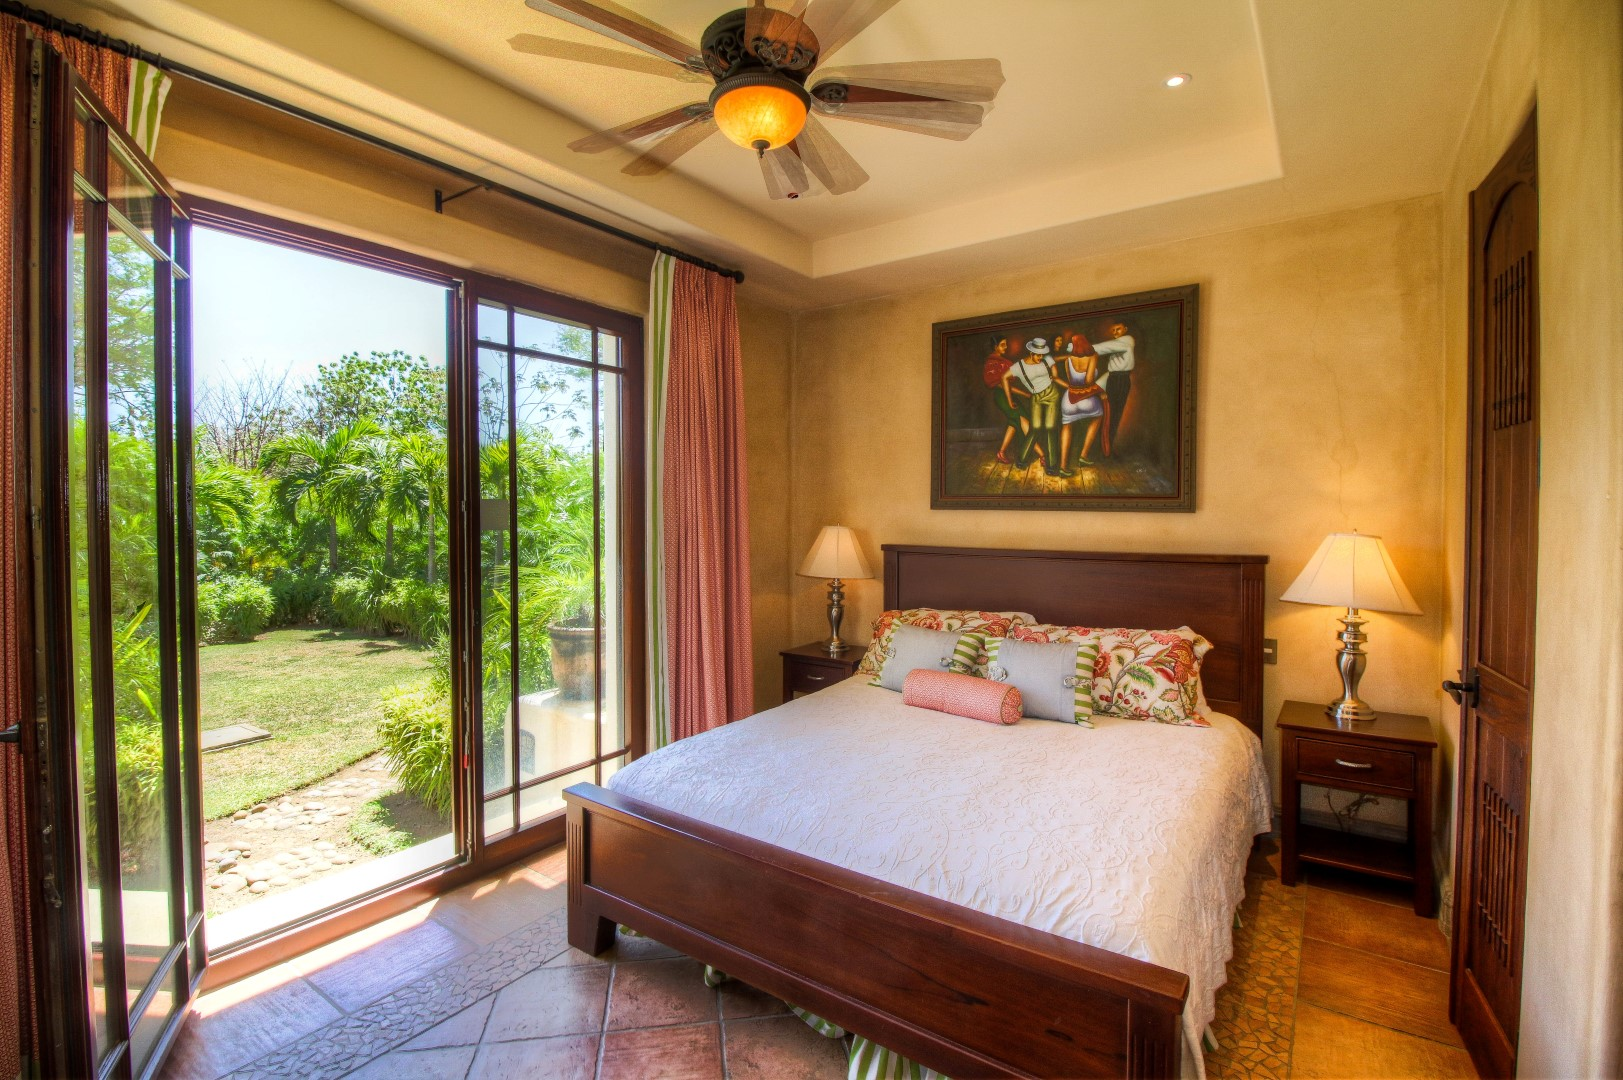 Bedroom opens up to backyard